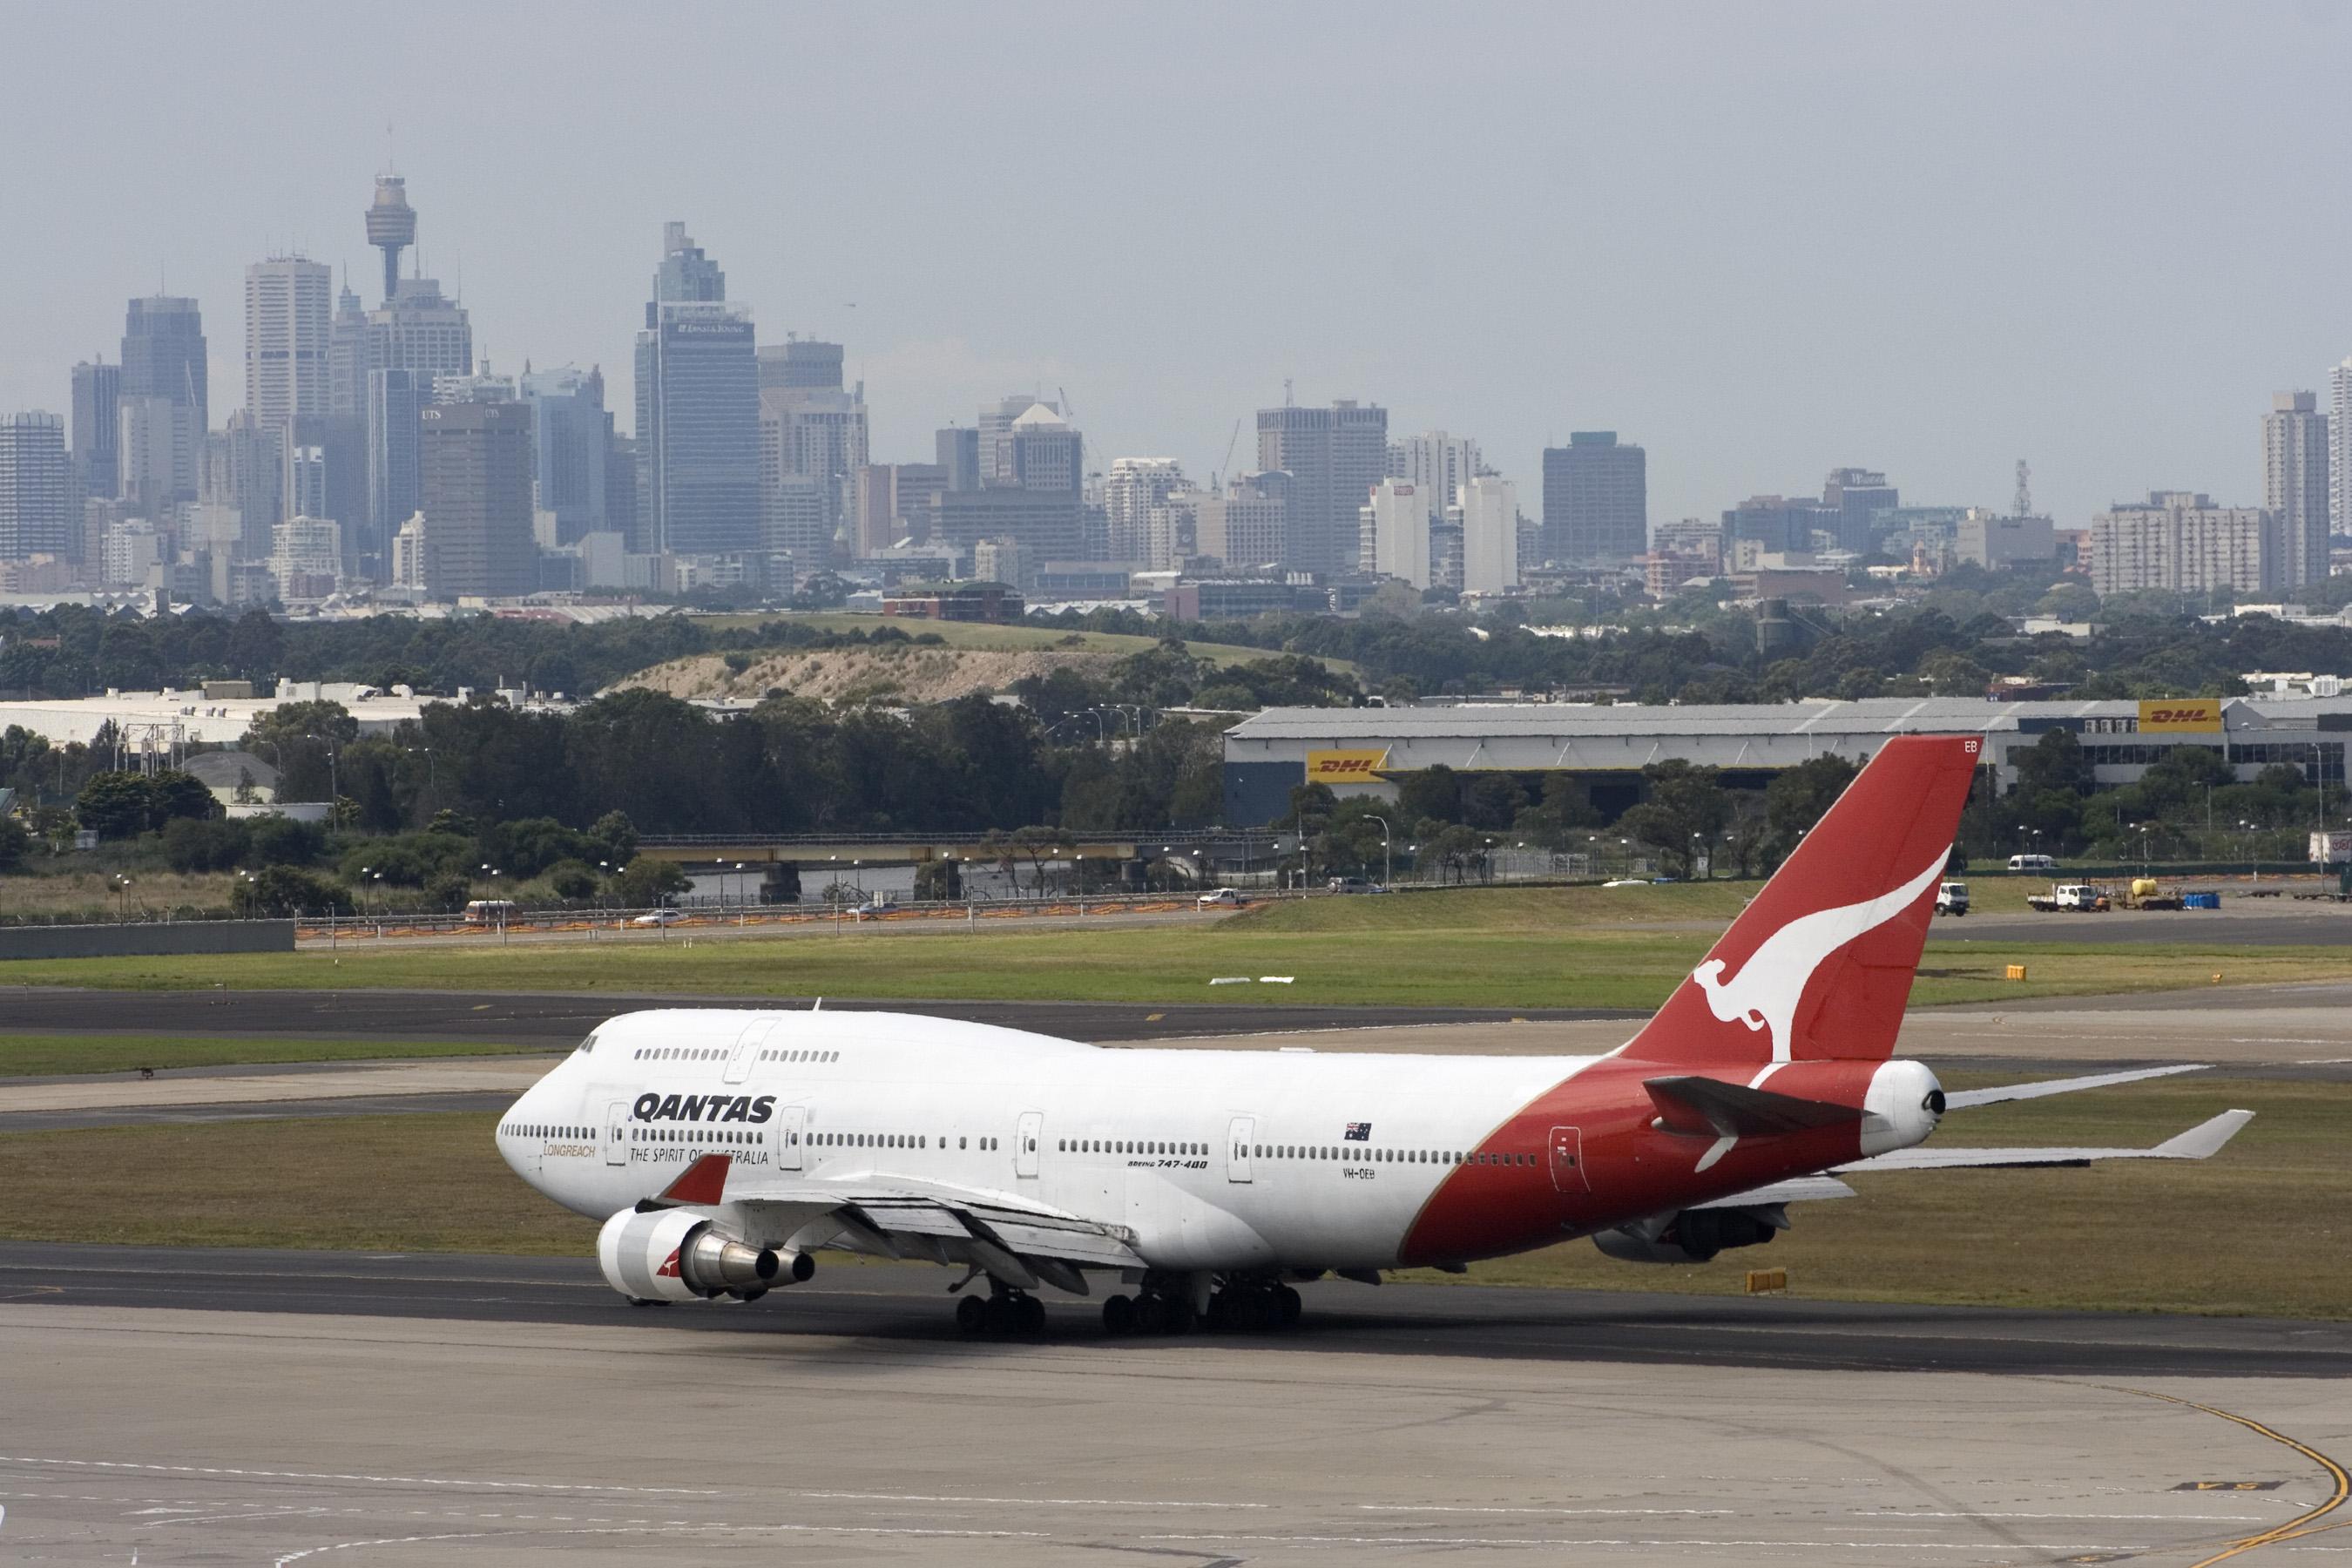 File:Qantas Boeing 747-400 at Sydney airport.jpg